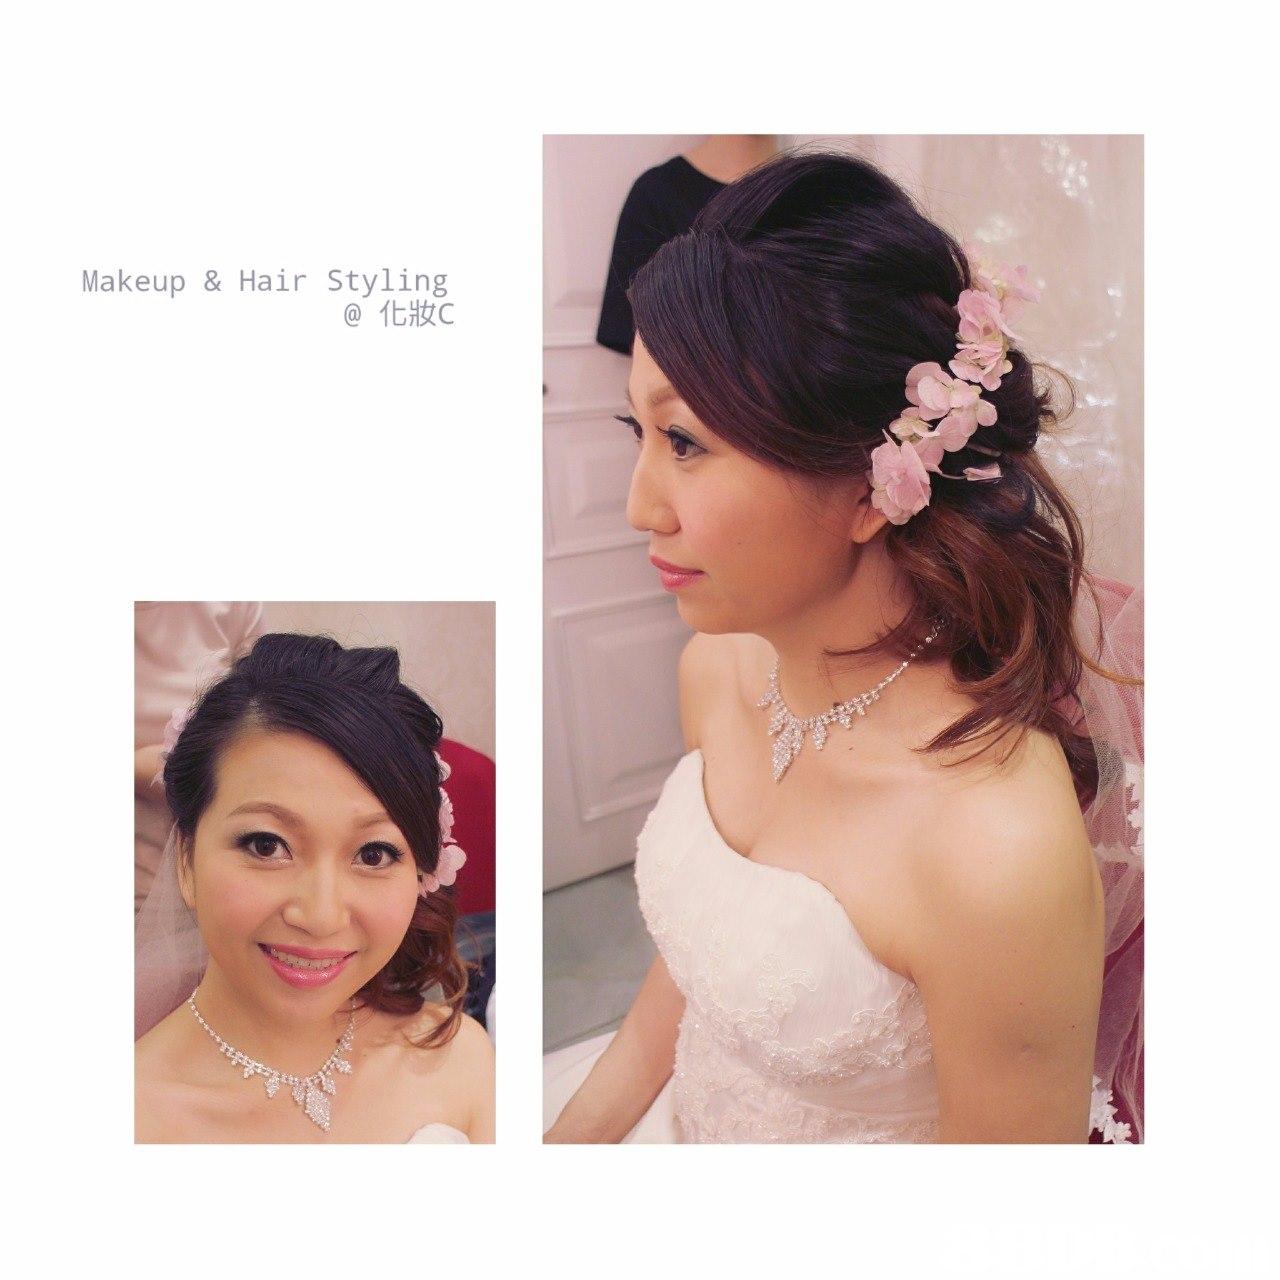 Makeup & Hair Styling @化妝c,hair,bride,hair accessory,headpiece,forehead